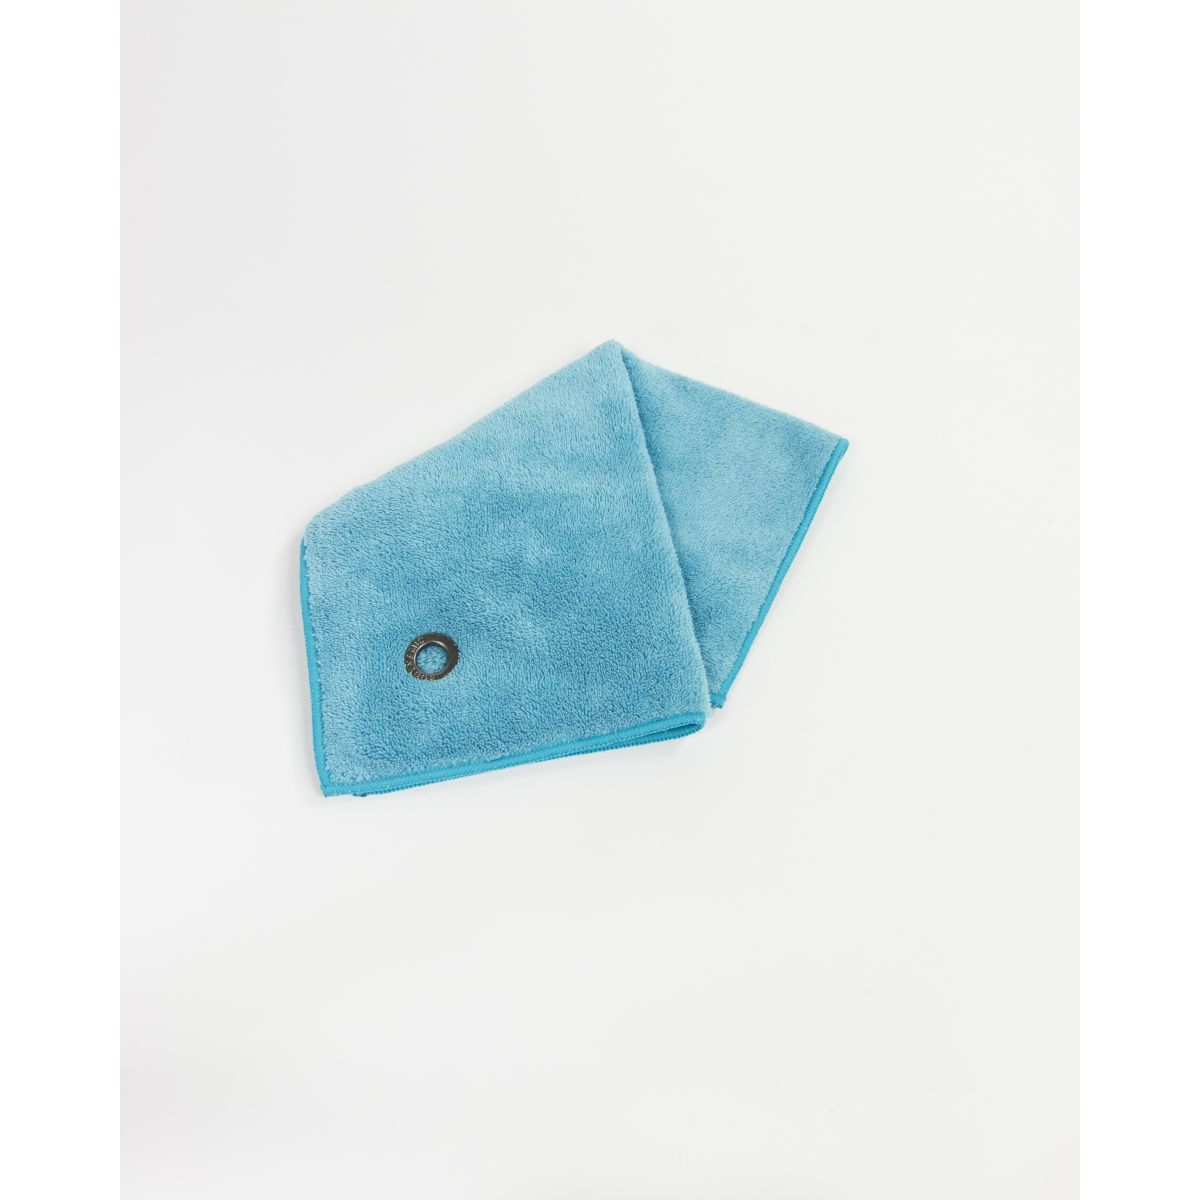 serviette mains visage microfibre vaianu bleu naiade bodynamic. Black Bedroom Furniture Sets. Home Design Ideas